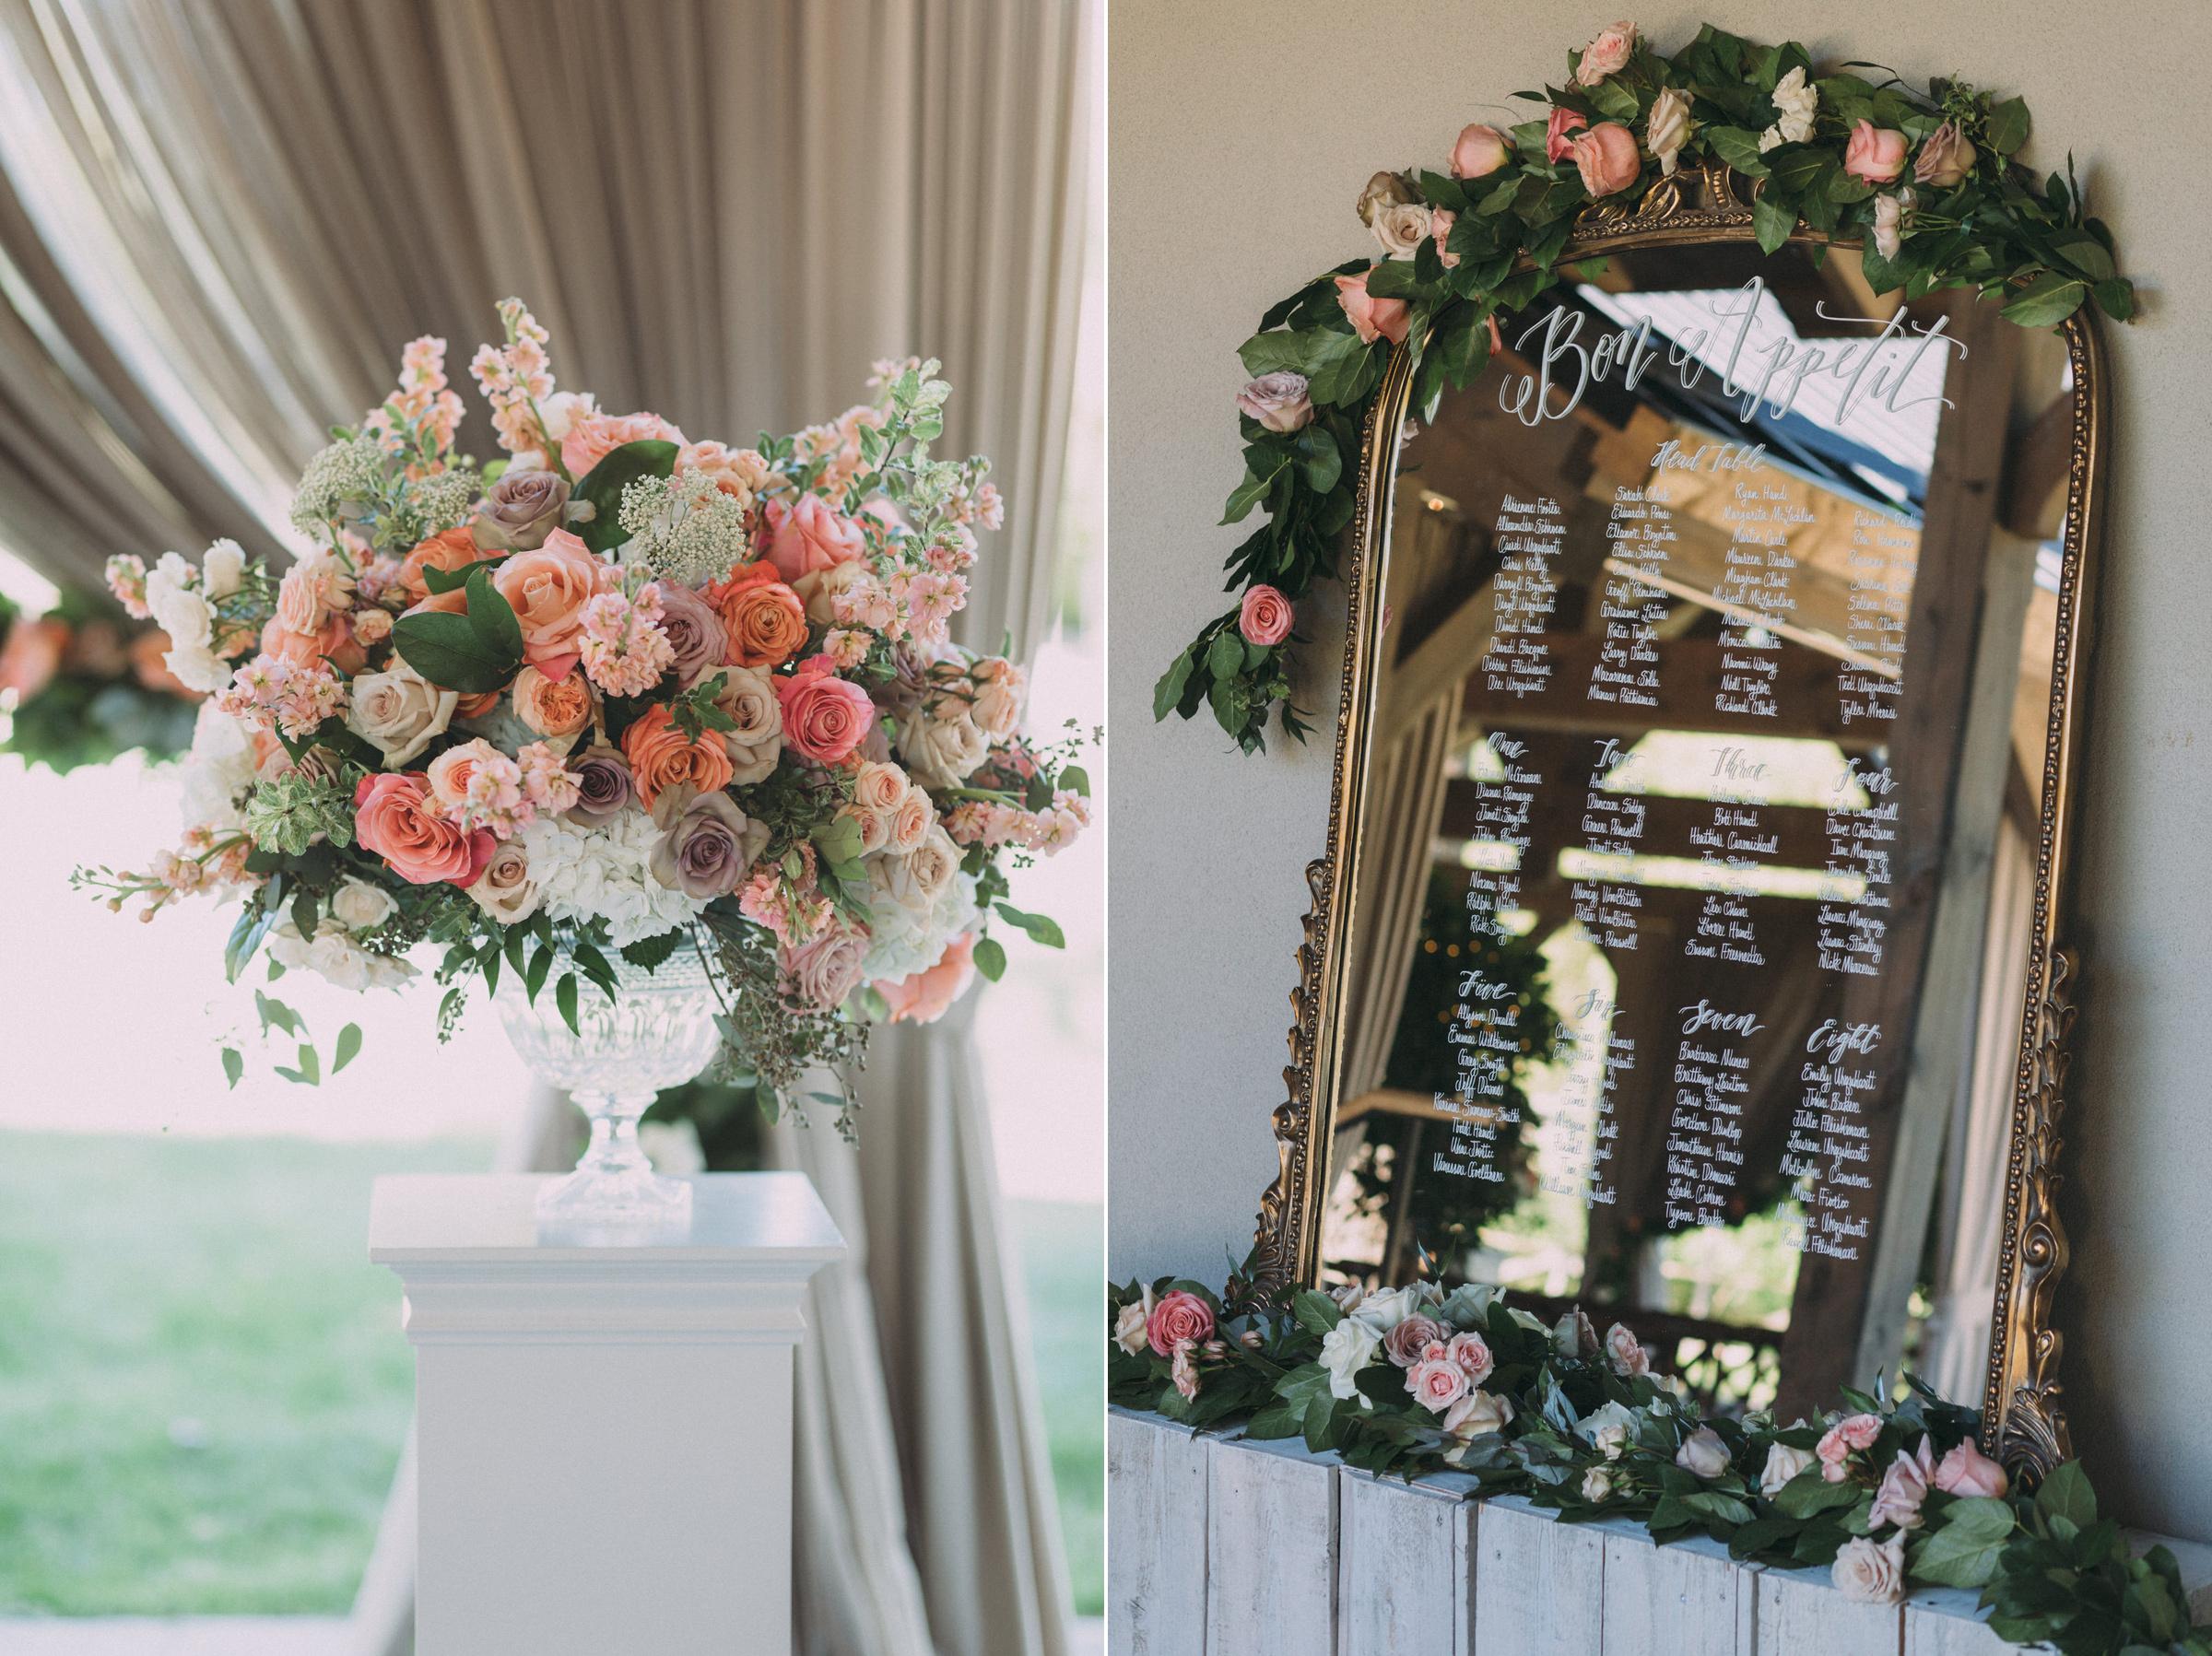 Langdon-Hall-wedding-photography-Cambridge-by-Sam-Wong-of-Visual-Cravings_Sarah-Ryan_28.jpg